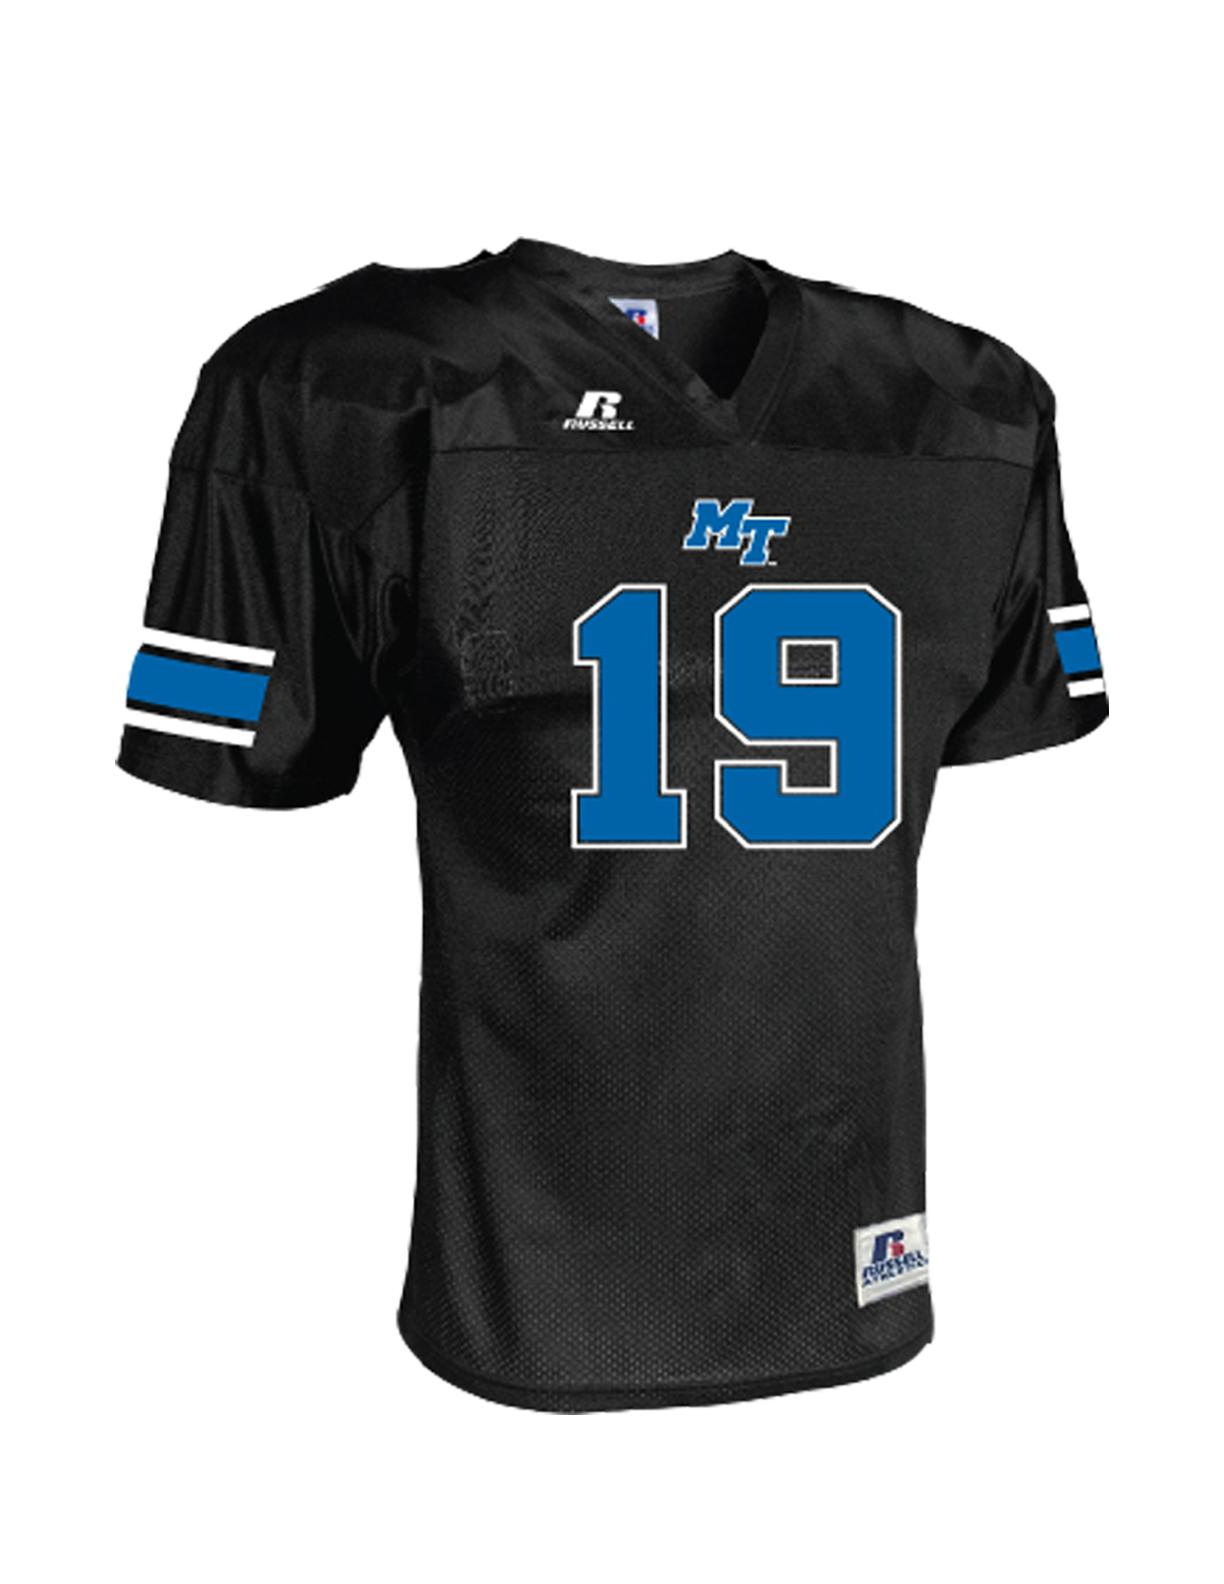 Youth MTSU Blue Raiders Replica Football Jersey